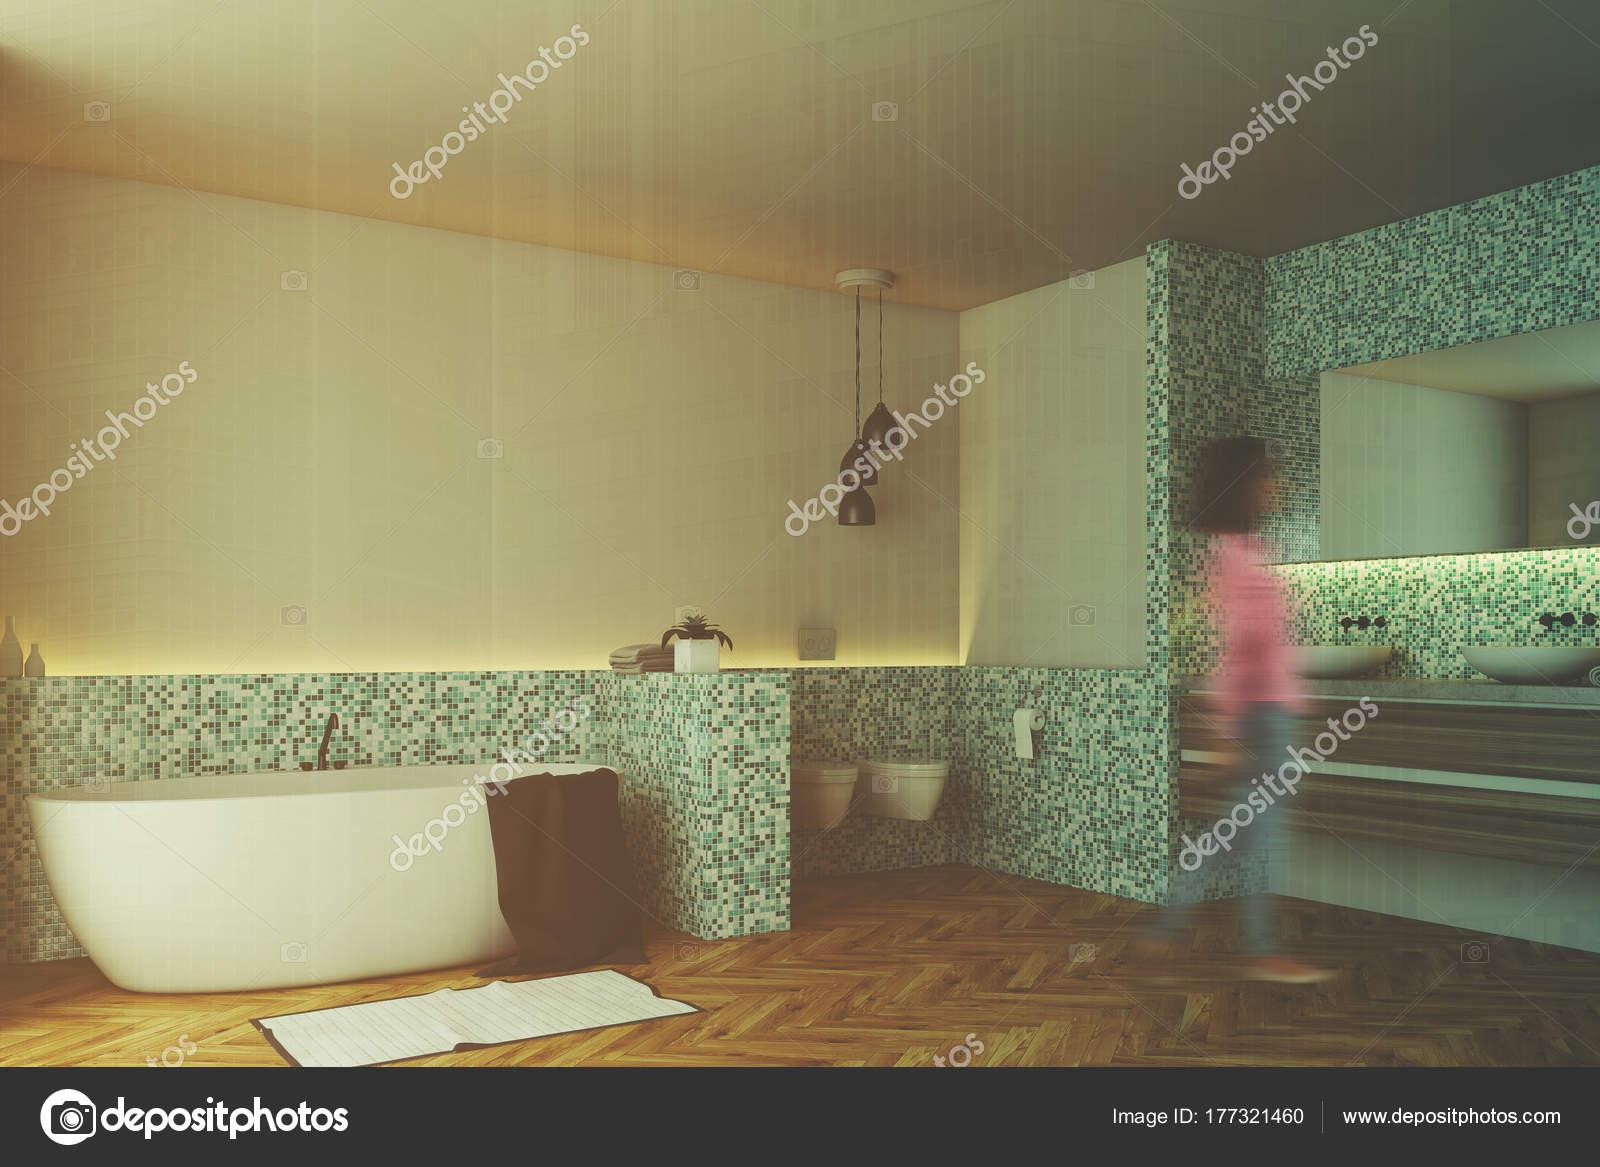 Badkamer En Tegels : Groene tegels badkamer en toilet hoek vervagen u stockfoto